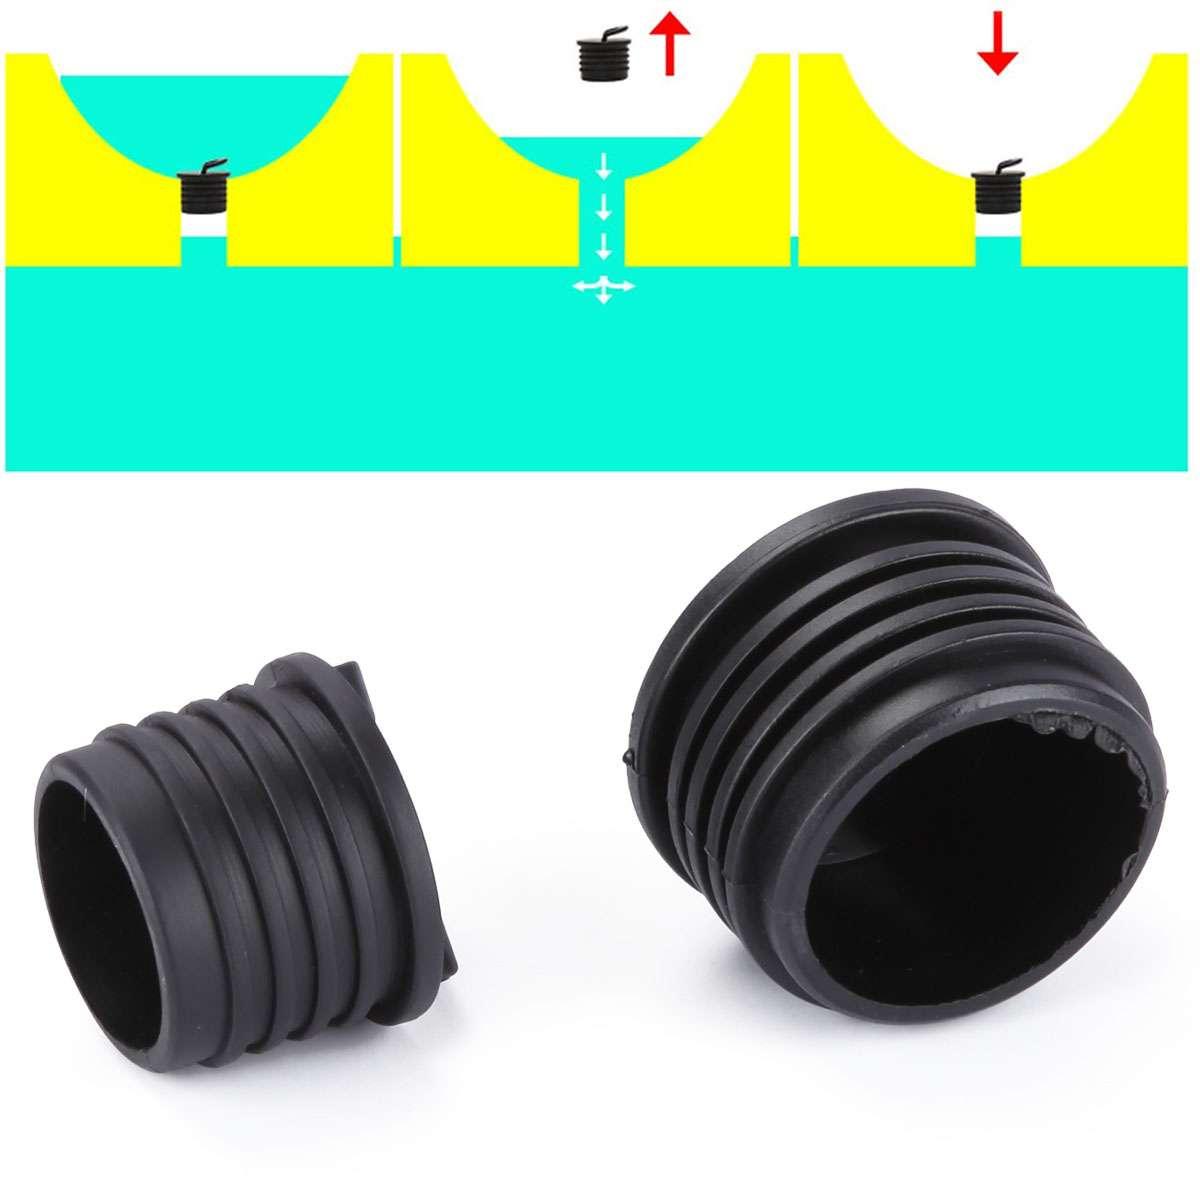 1-10 PCS Silicone Kayak Scupper Plug Kit Canoe Drain Holes Stopper Replacement